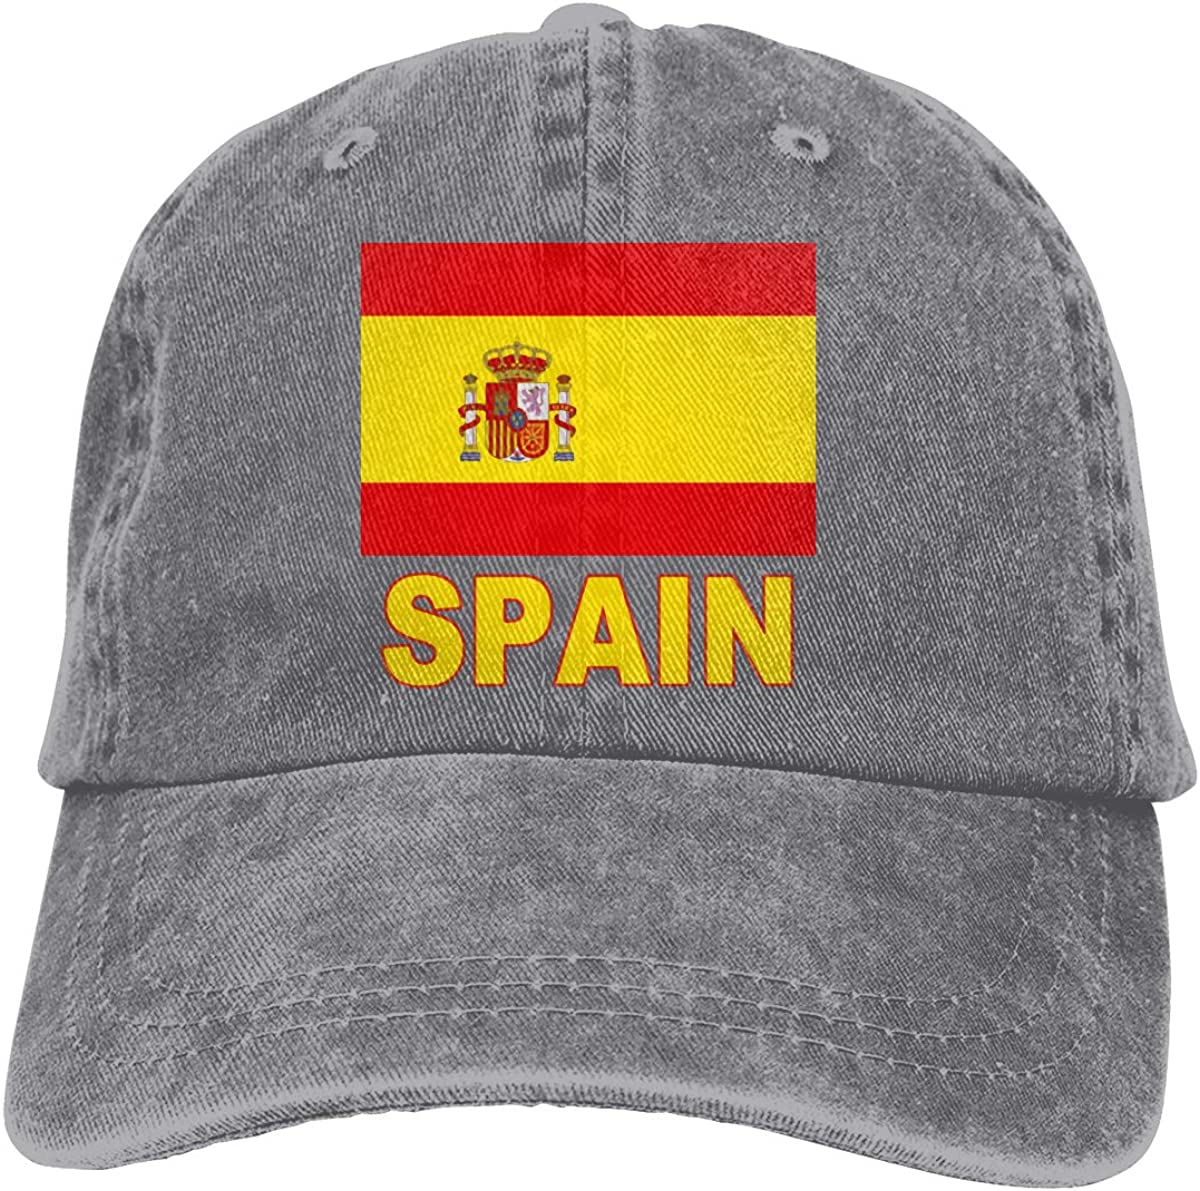 Adult Fashion Cotton Denim Baseball Cap The Pride of Spain Classic Dad Hat Adjustable Plain Cap